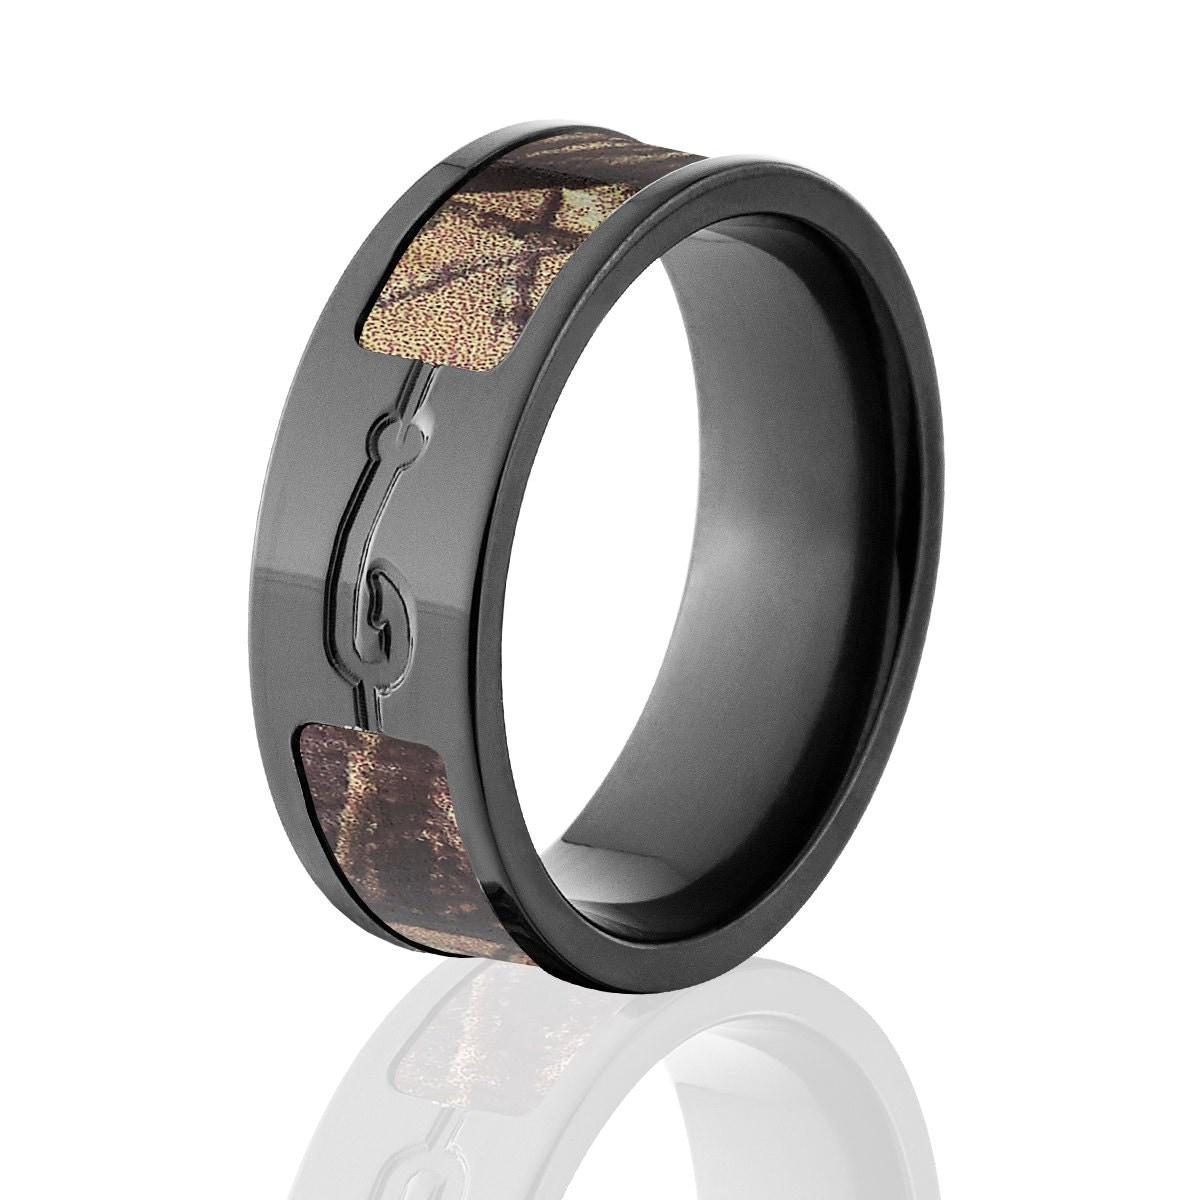 Realtree Wedding Rings: Fishhook AP Camo Rings RealTree Camo Rings Camo Wedding